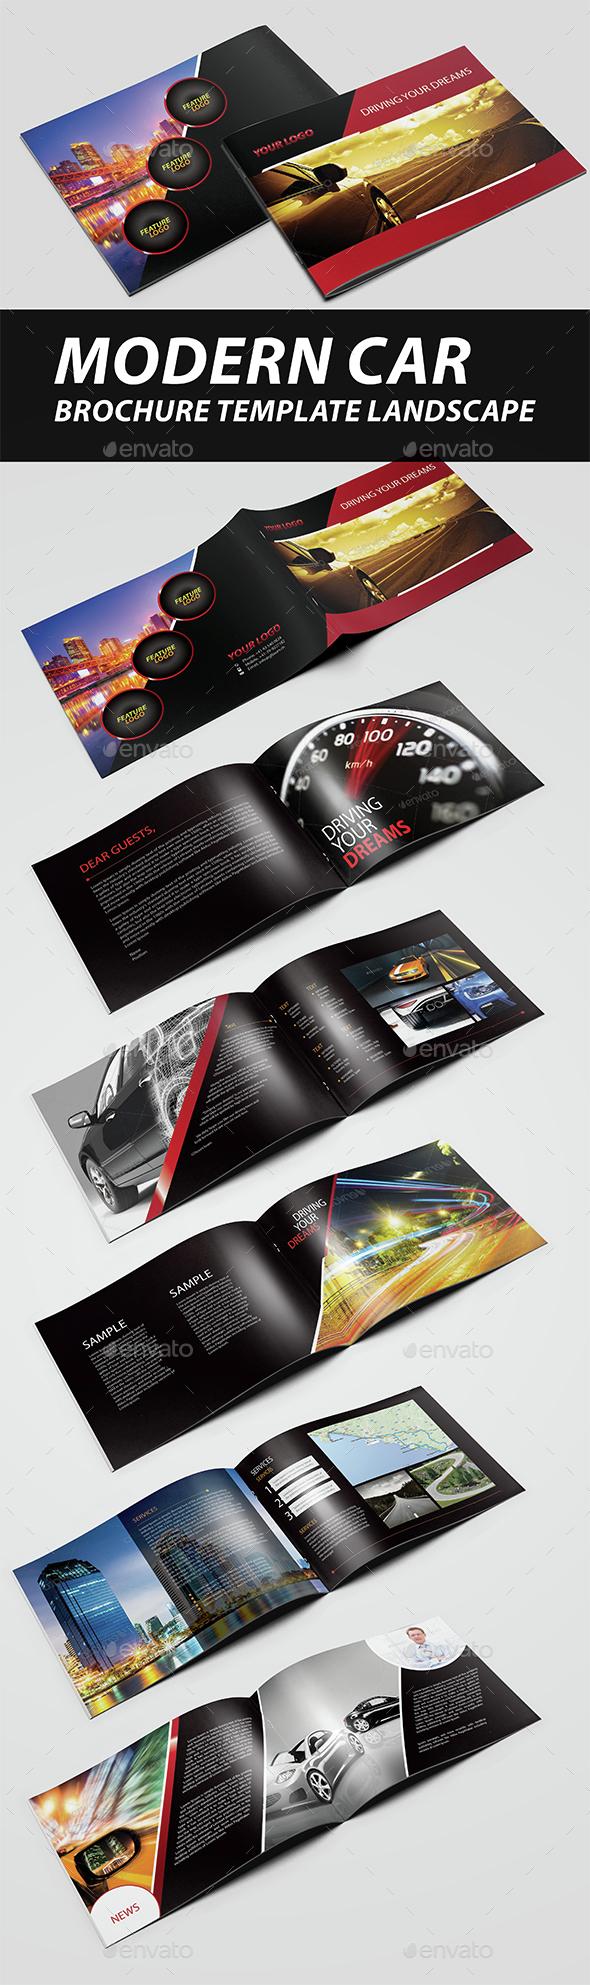 Modern Car Brochure Landscape - Brochures Print Templates